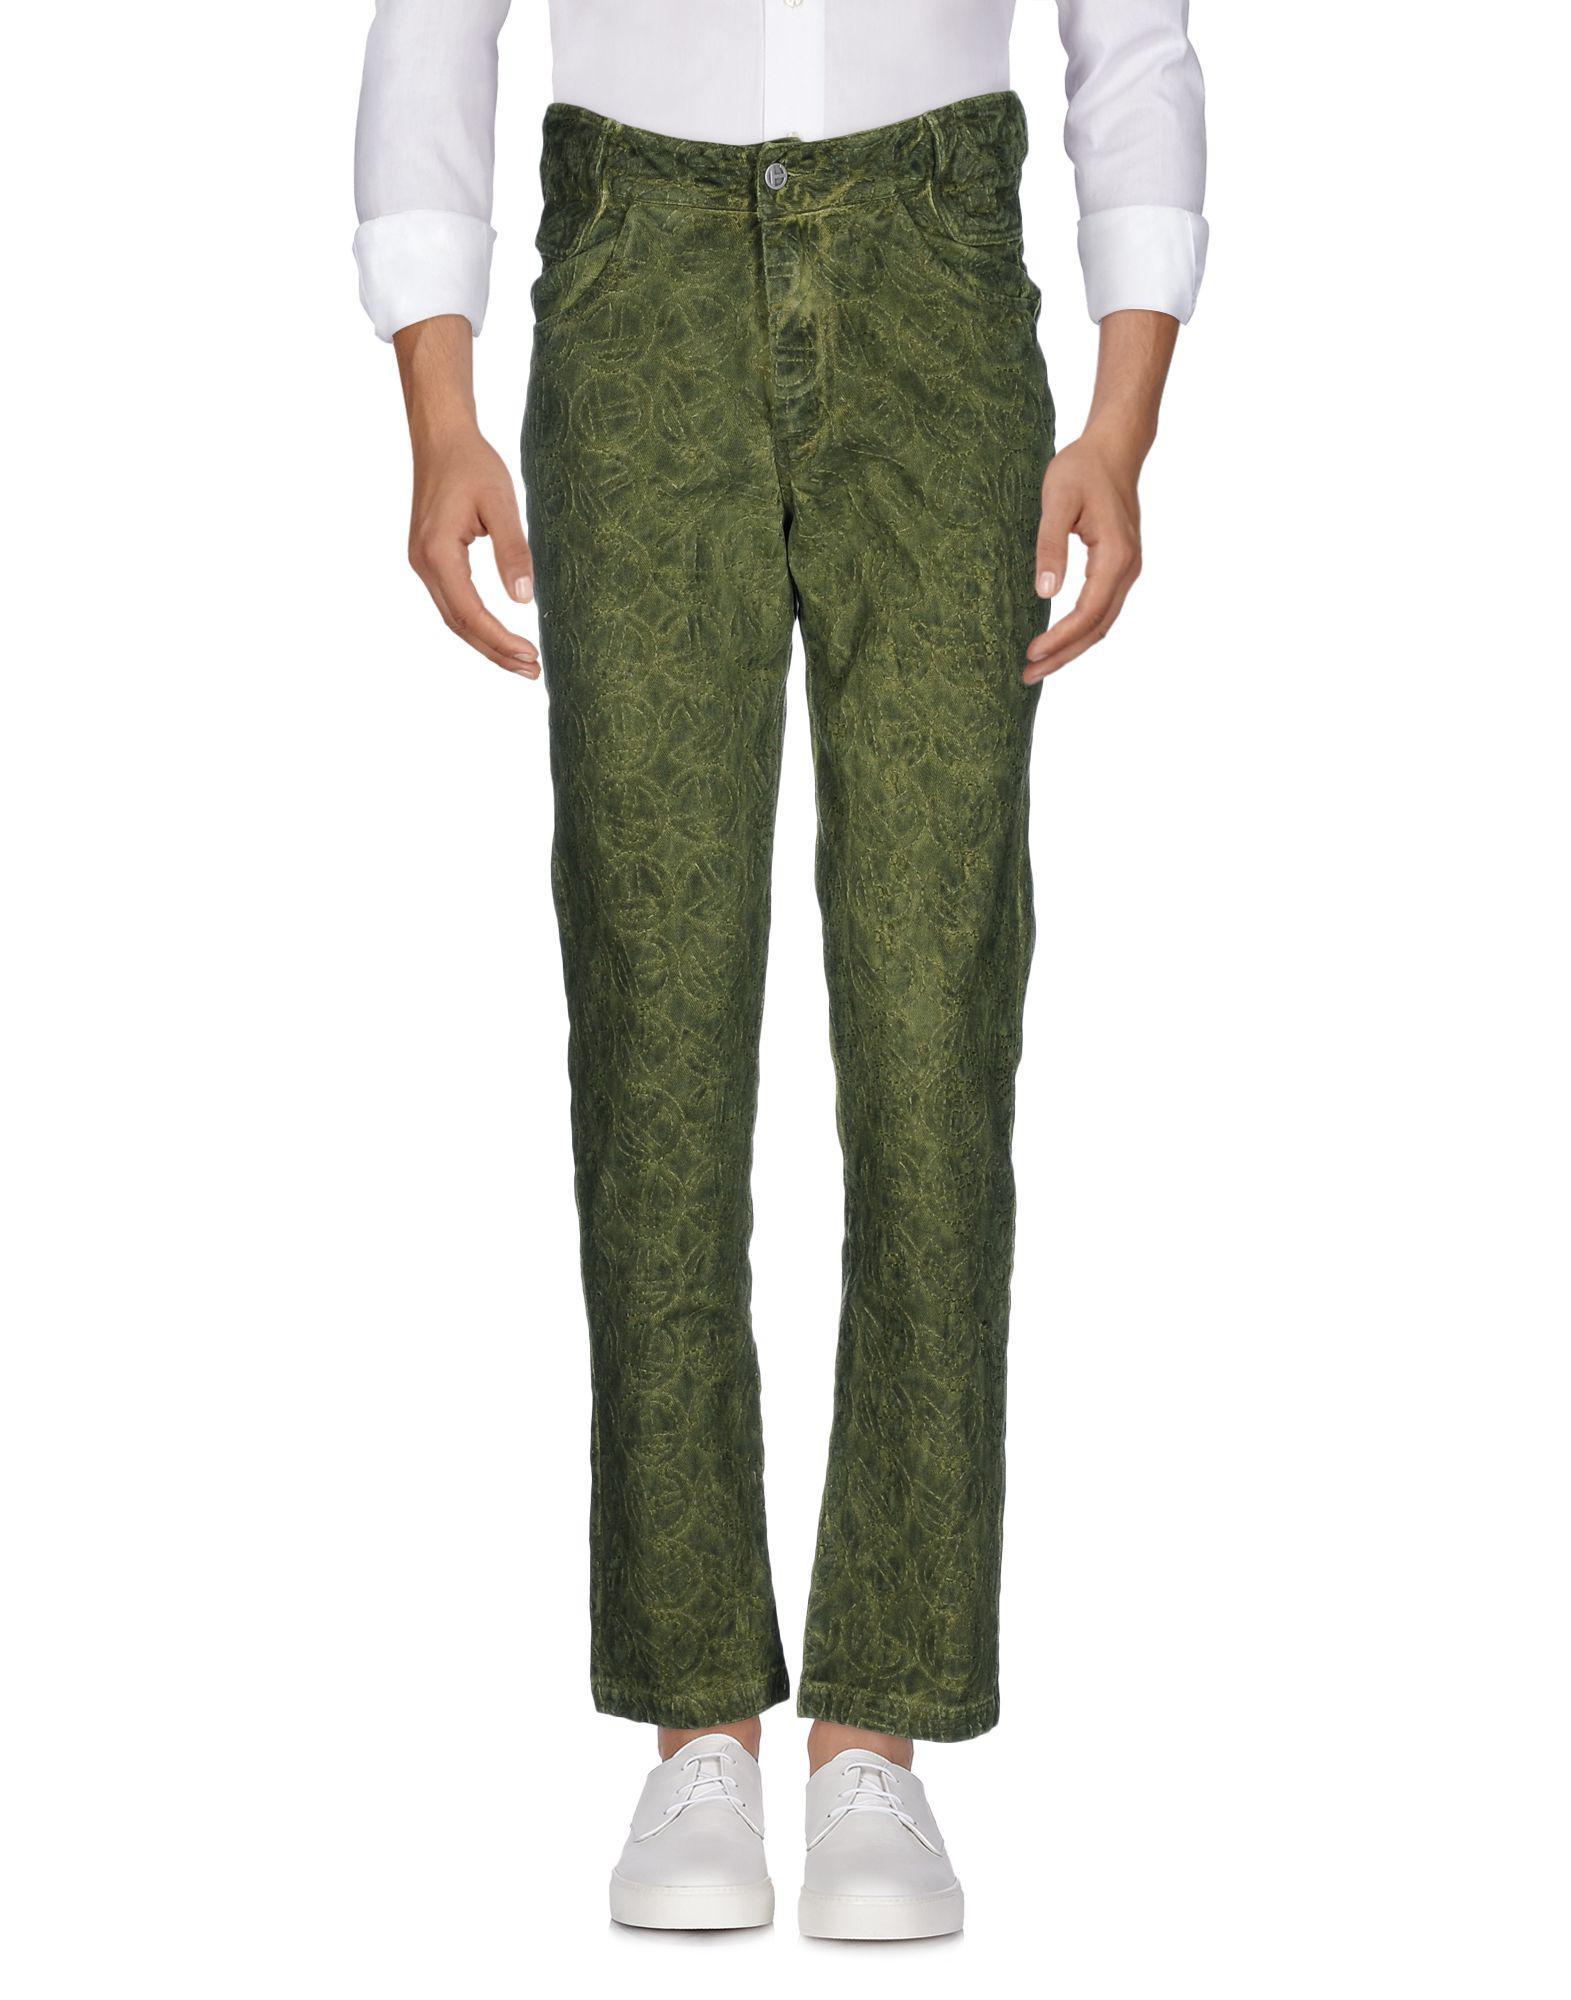 DENIM - Denim trousers Telfar Buy Cheap Huge Surprise Newest Websites Fast Delivery Big Discount Cheap Price opssd4uW